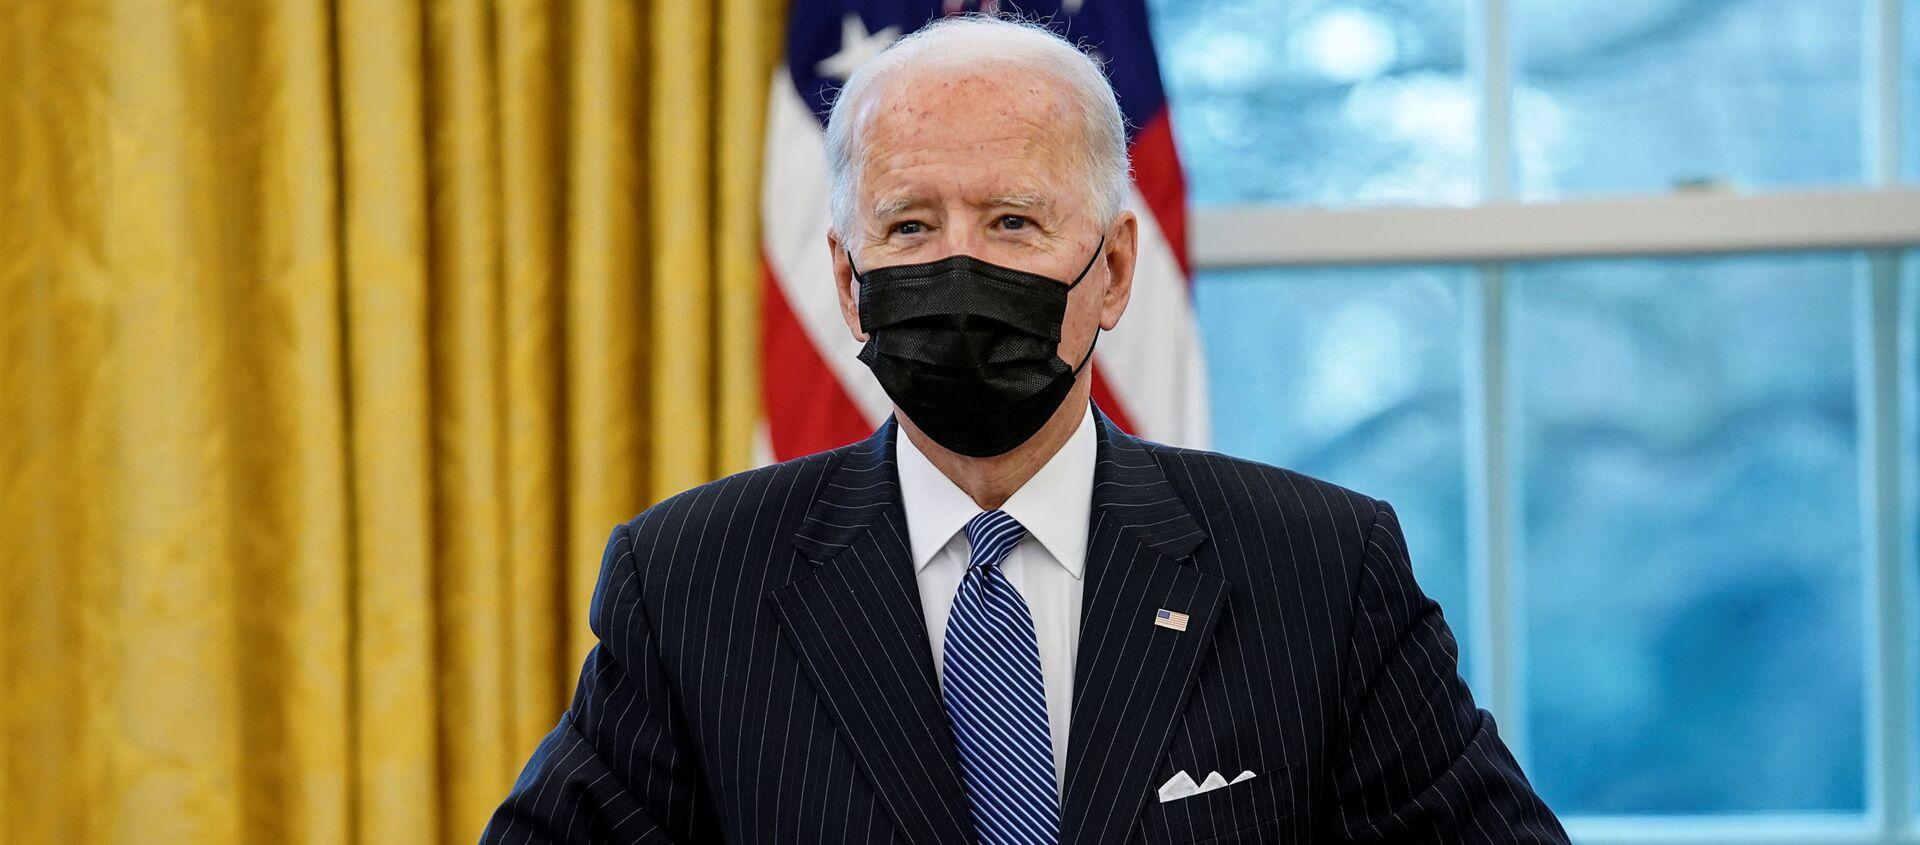 Joe Biden, presidente de EEUU  - Sputnik Mundo, 1920, 09.02.2021